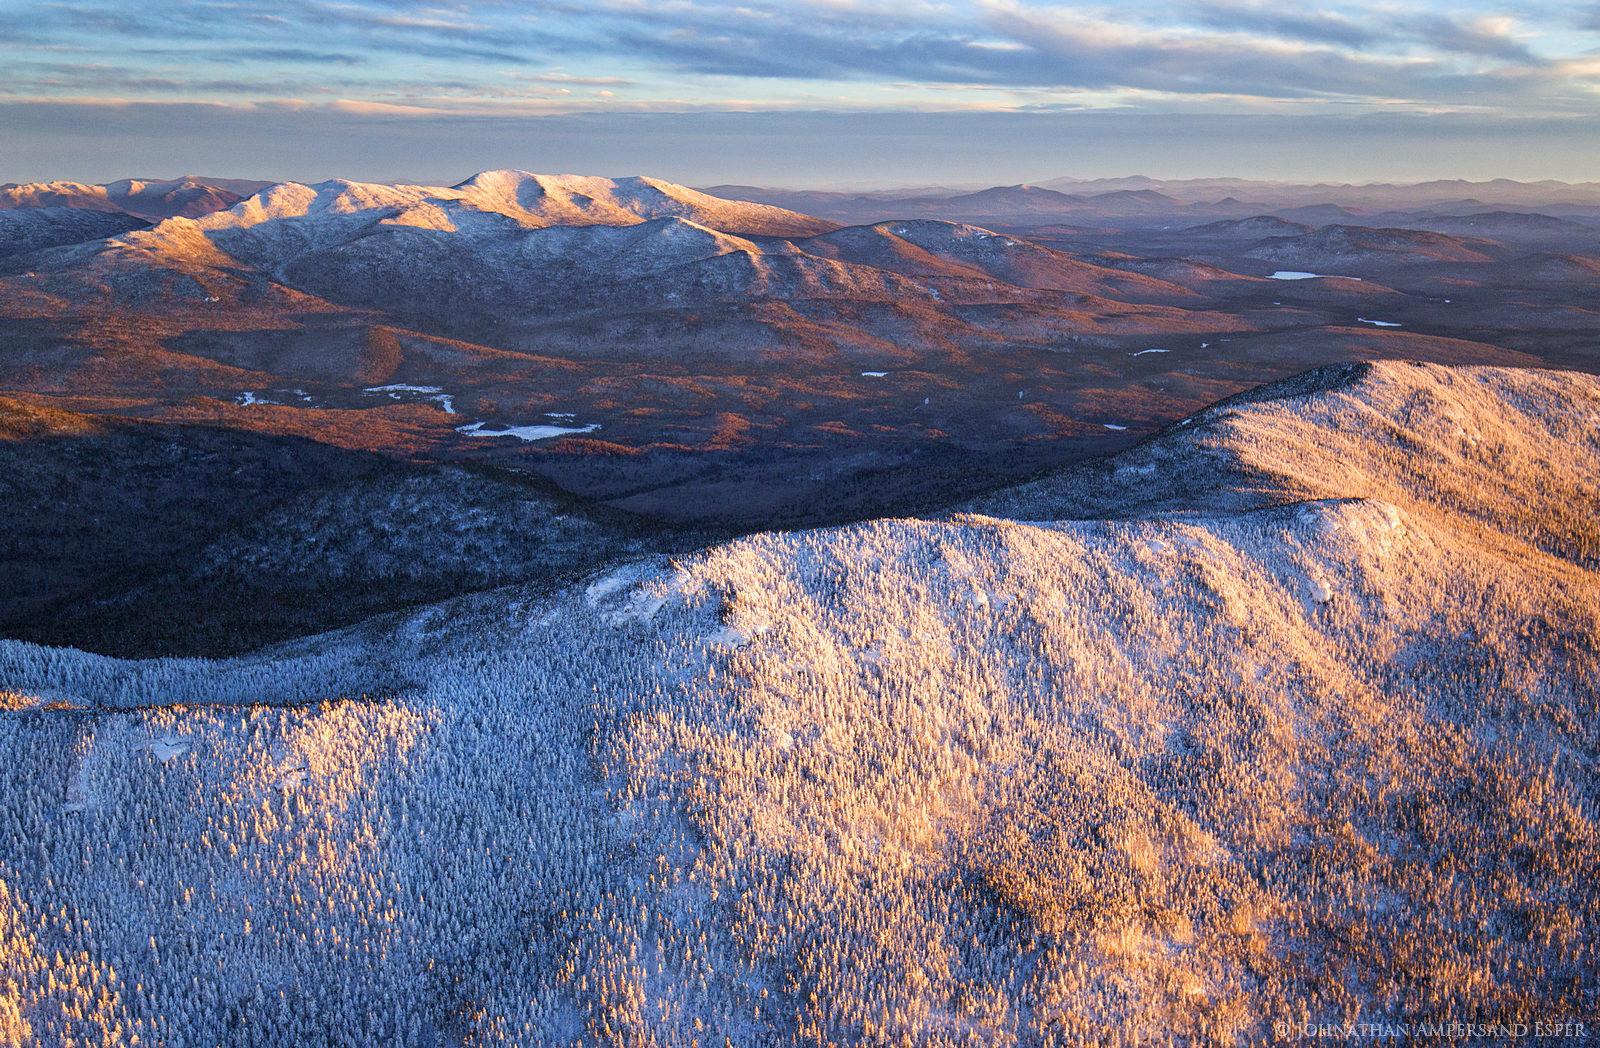 aerial,winter,High Peaks,2016,Adirondack Mountains,Adirondack High Peaks,Adirondacks,Santanoni Range,Panther Mt,Santanoni Peak,Santanoni,Seward Range,Donaldson,Donaldson ridge, photo